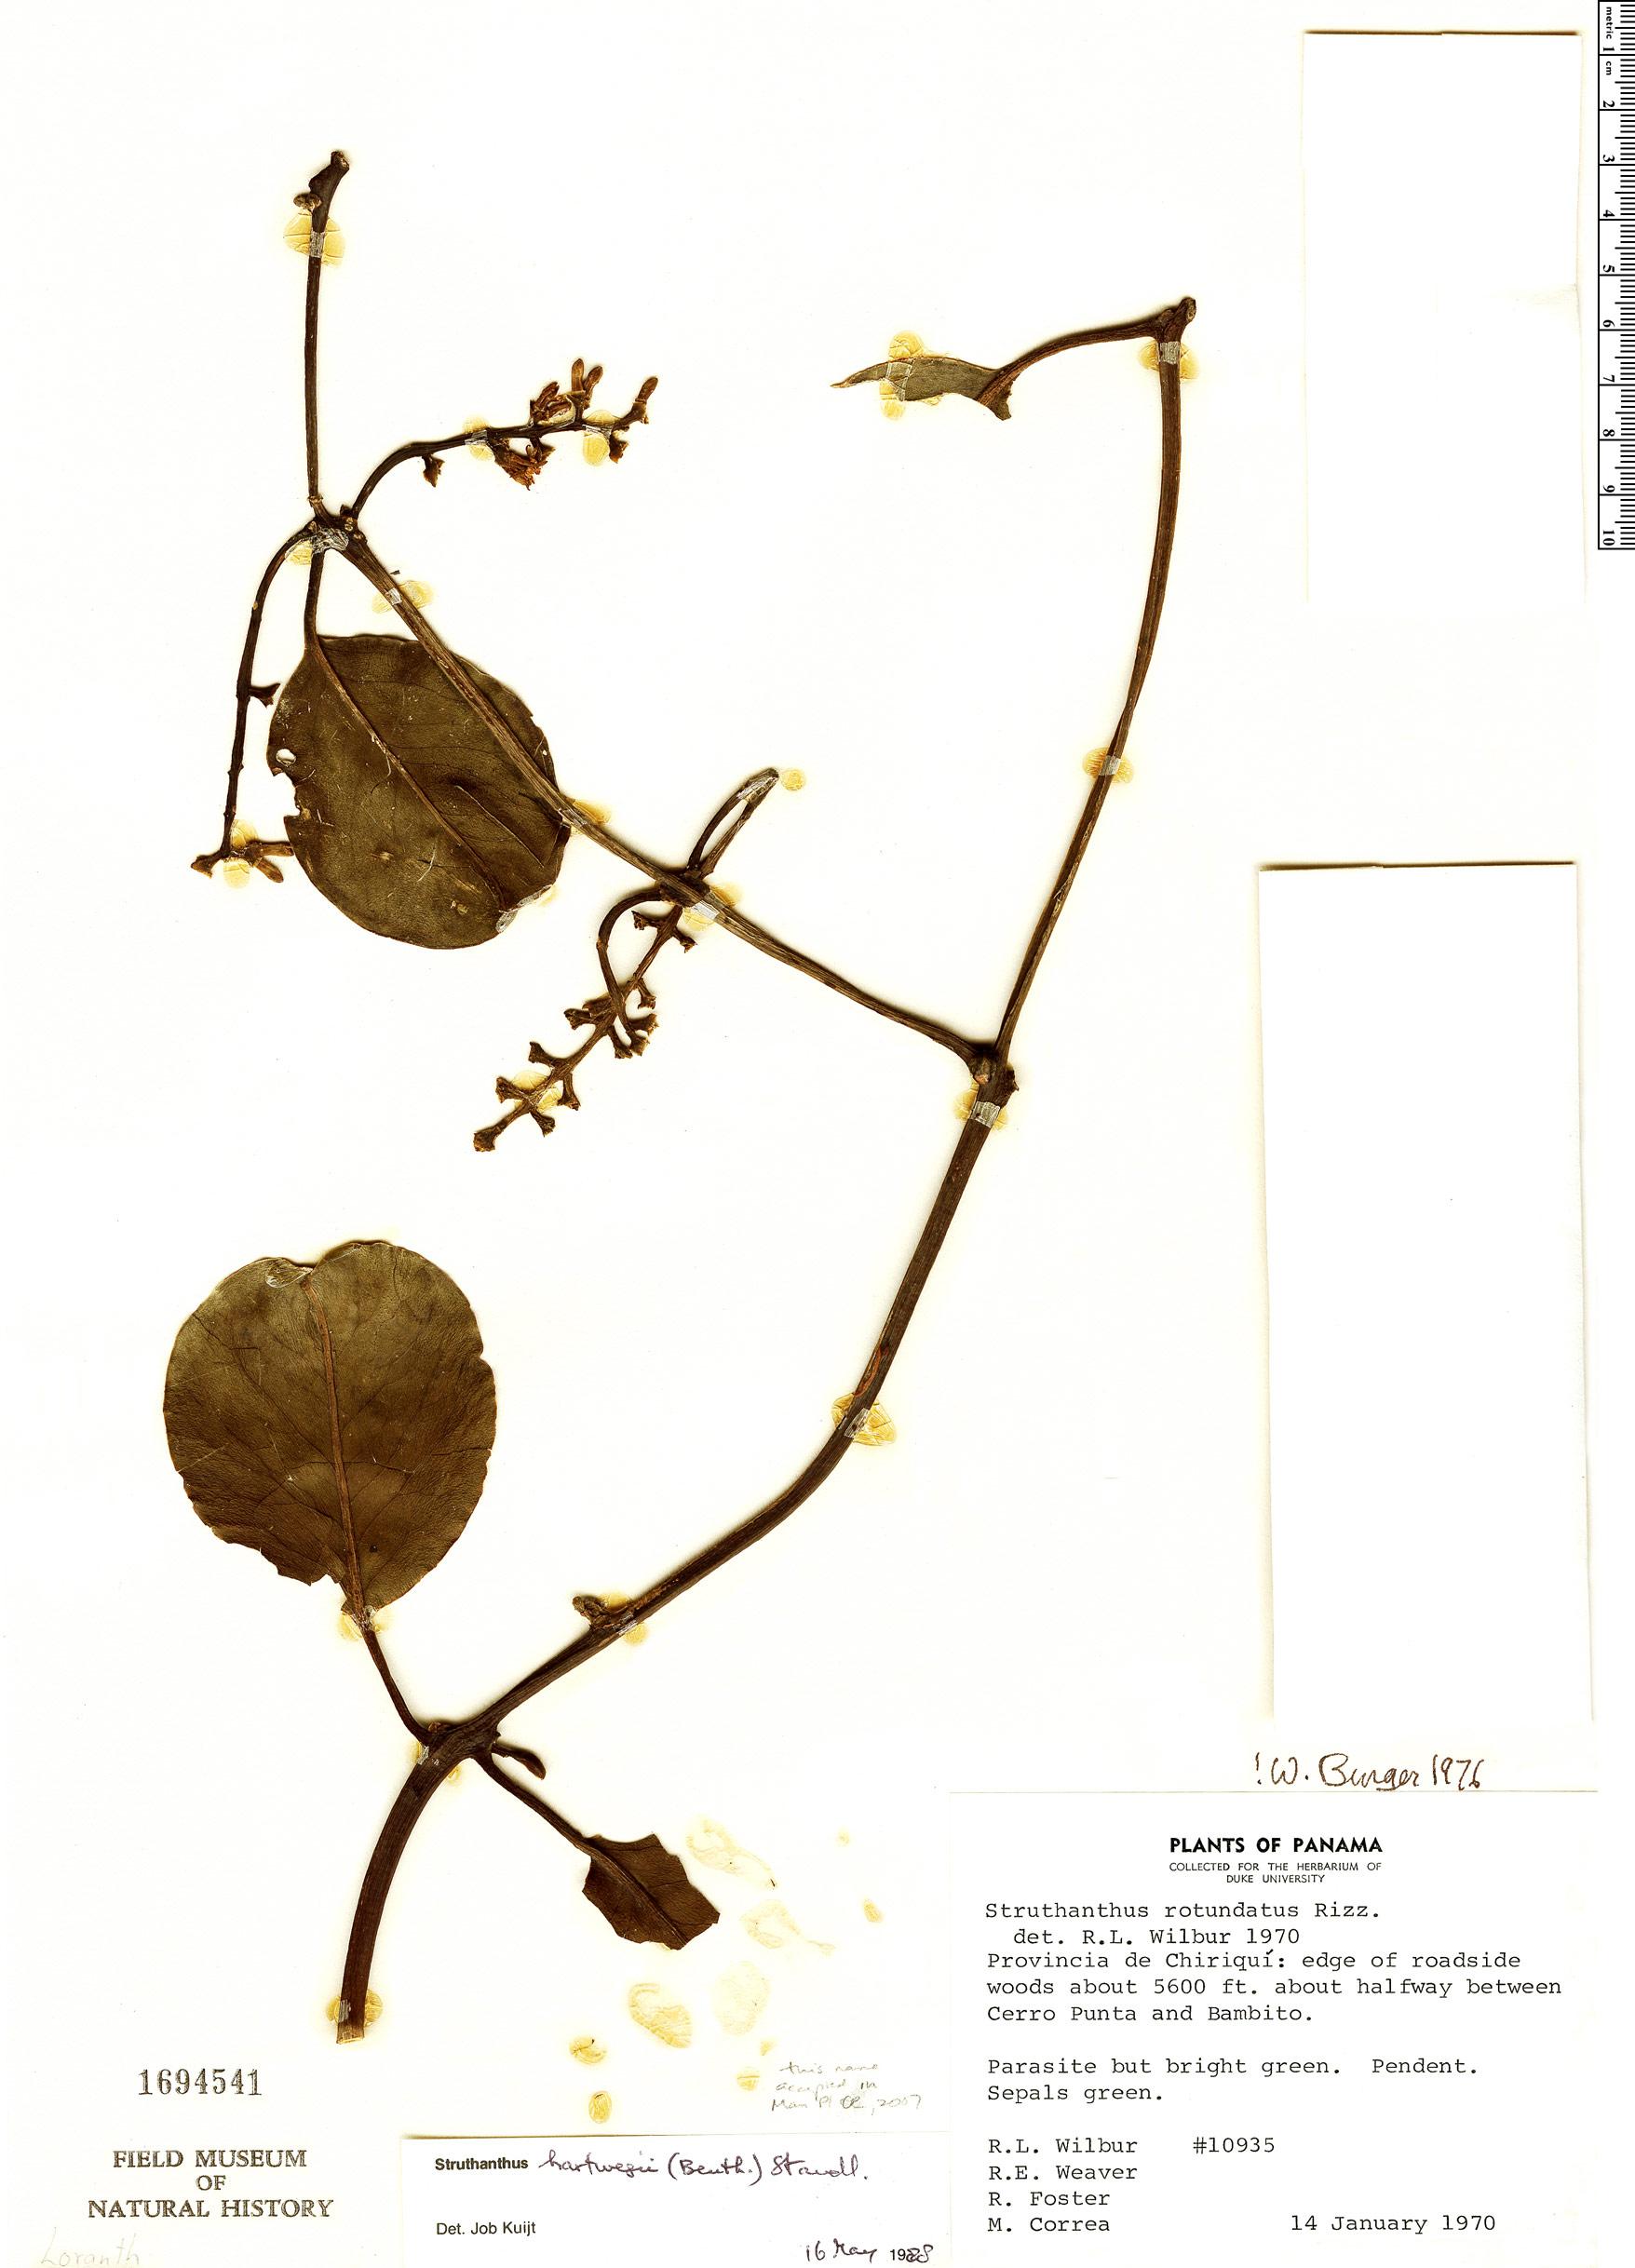 Specimen: Struthanthus hartwegii